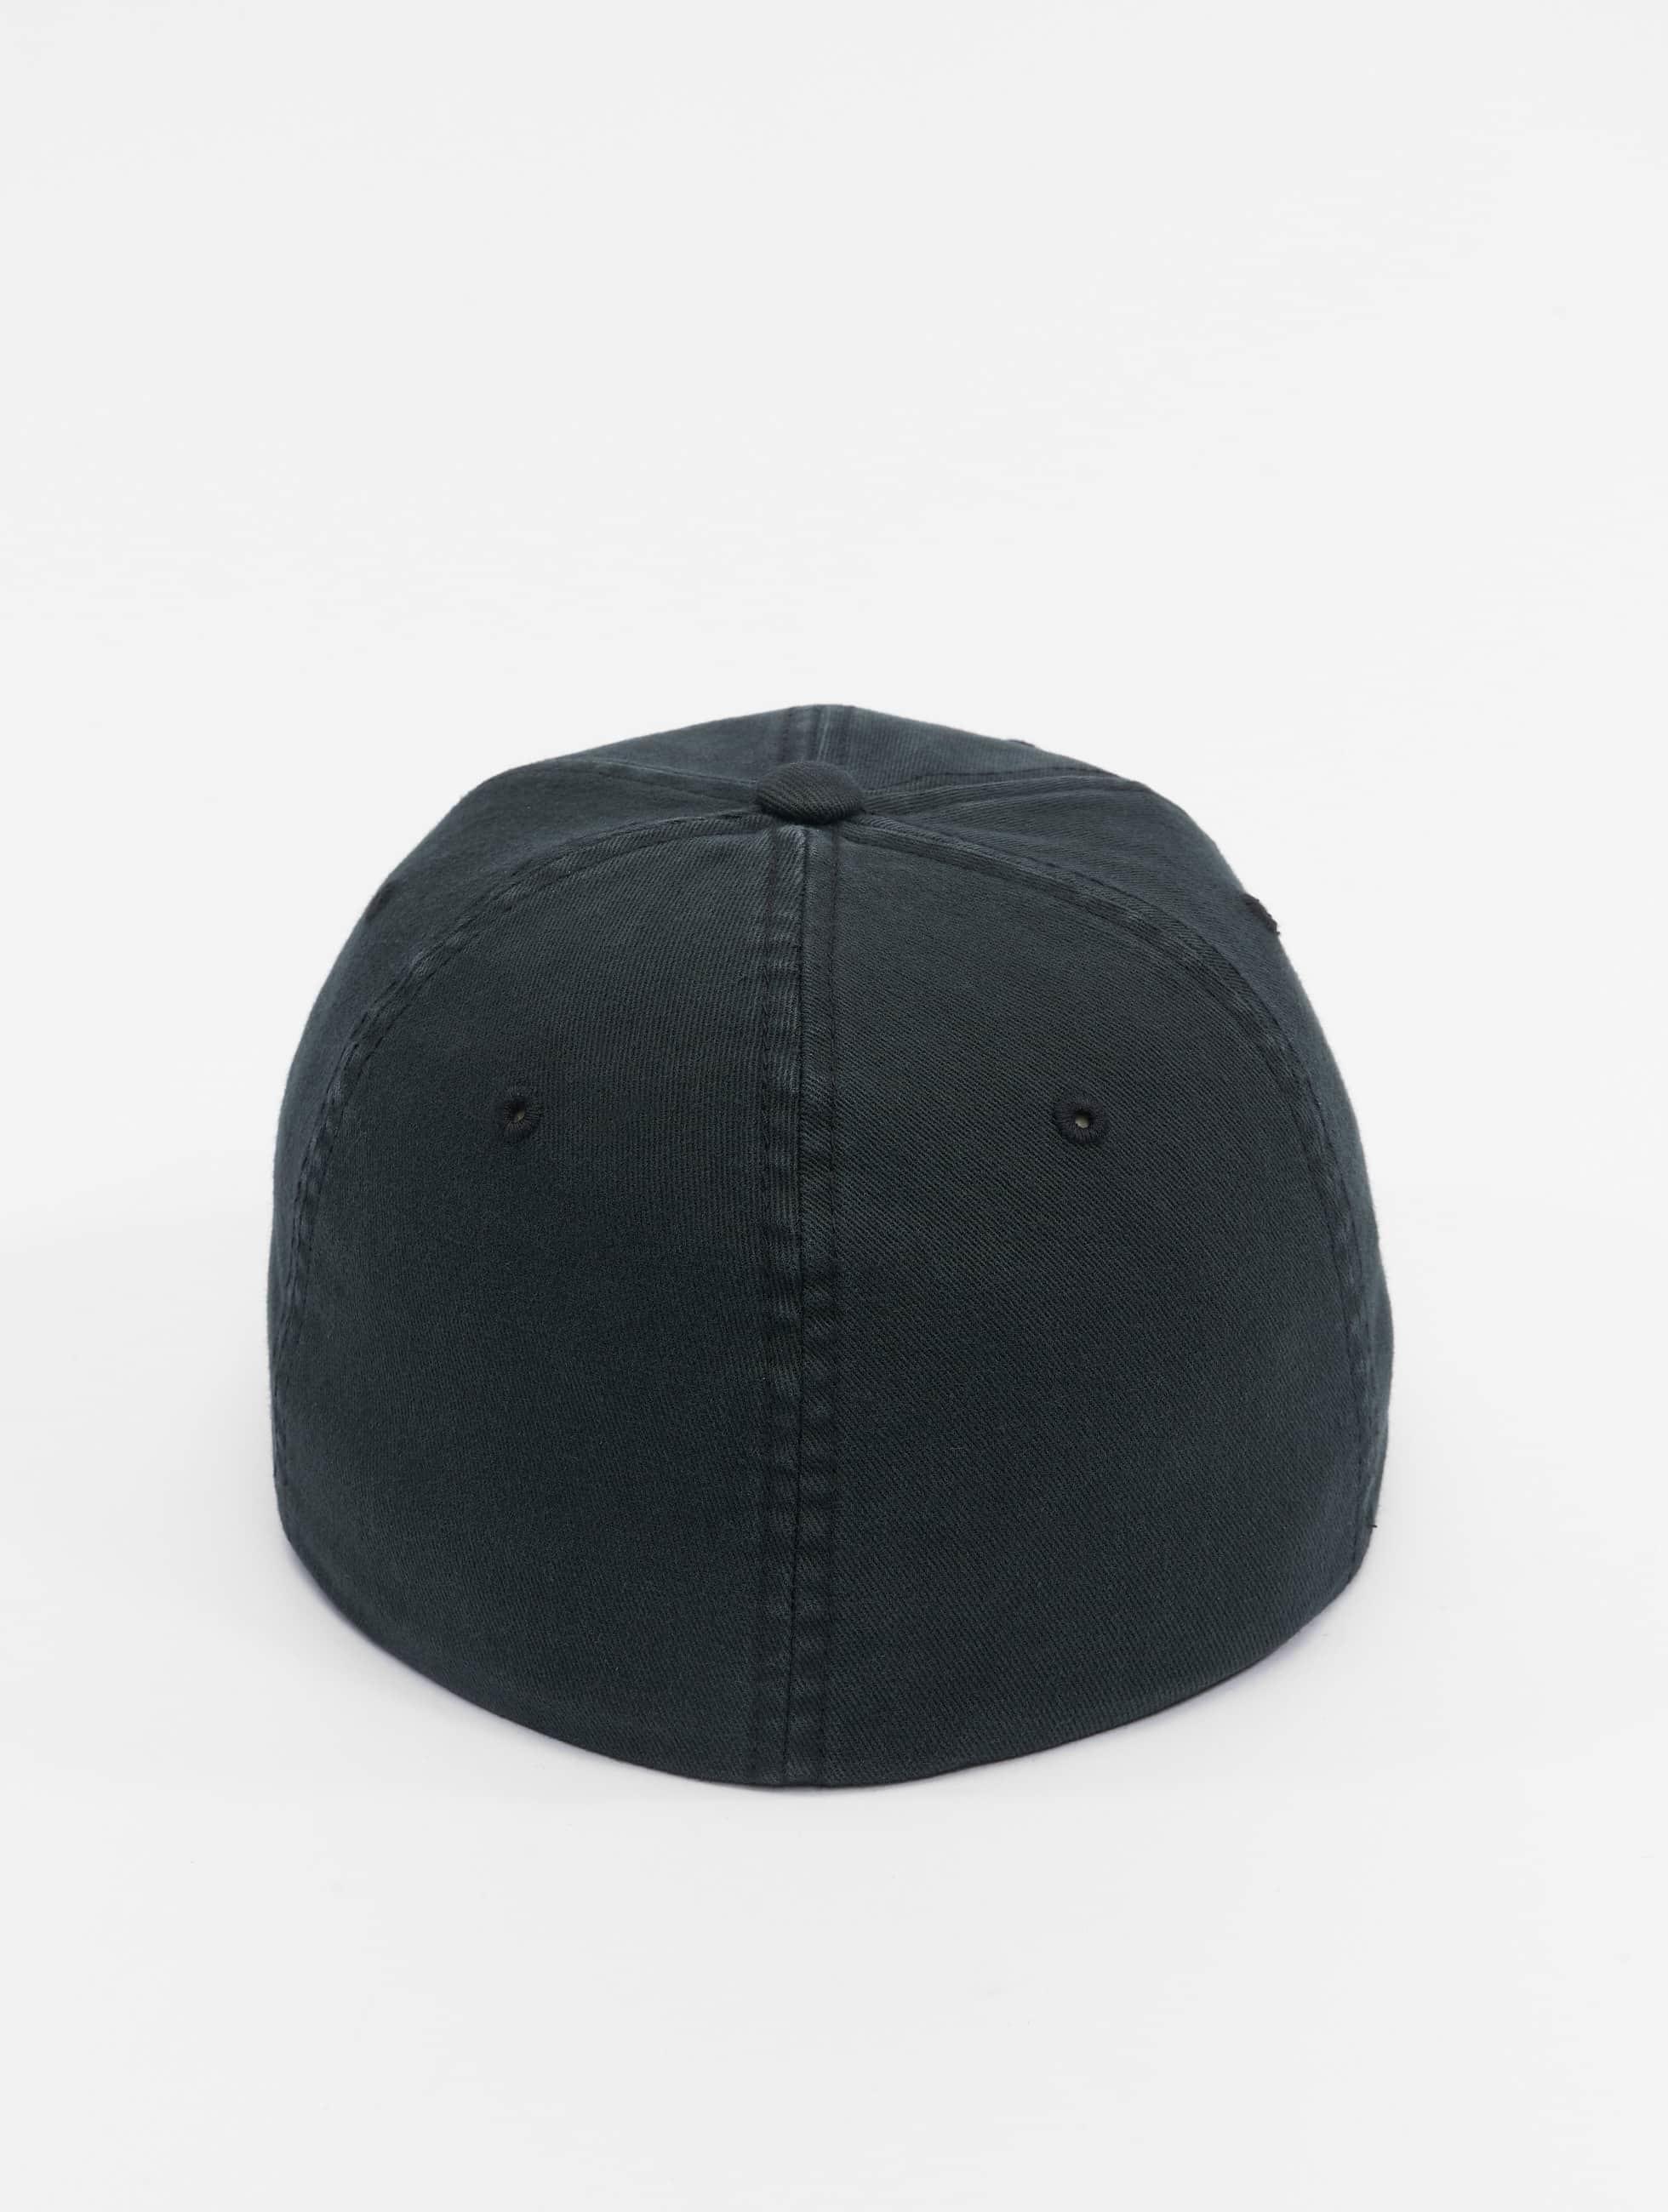 Flexfit Бейсболкa Flexfit Garment Washed Cotton Dat черный